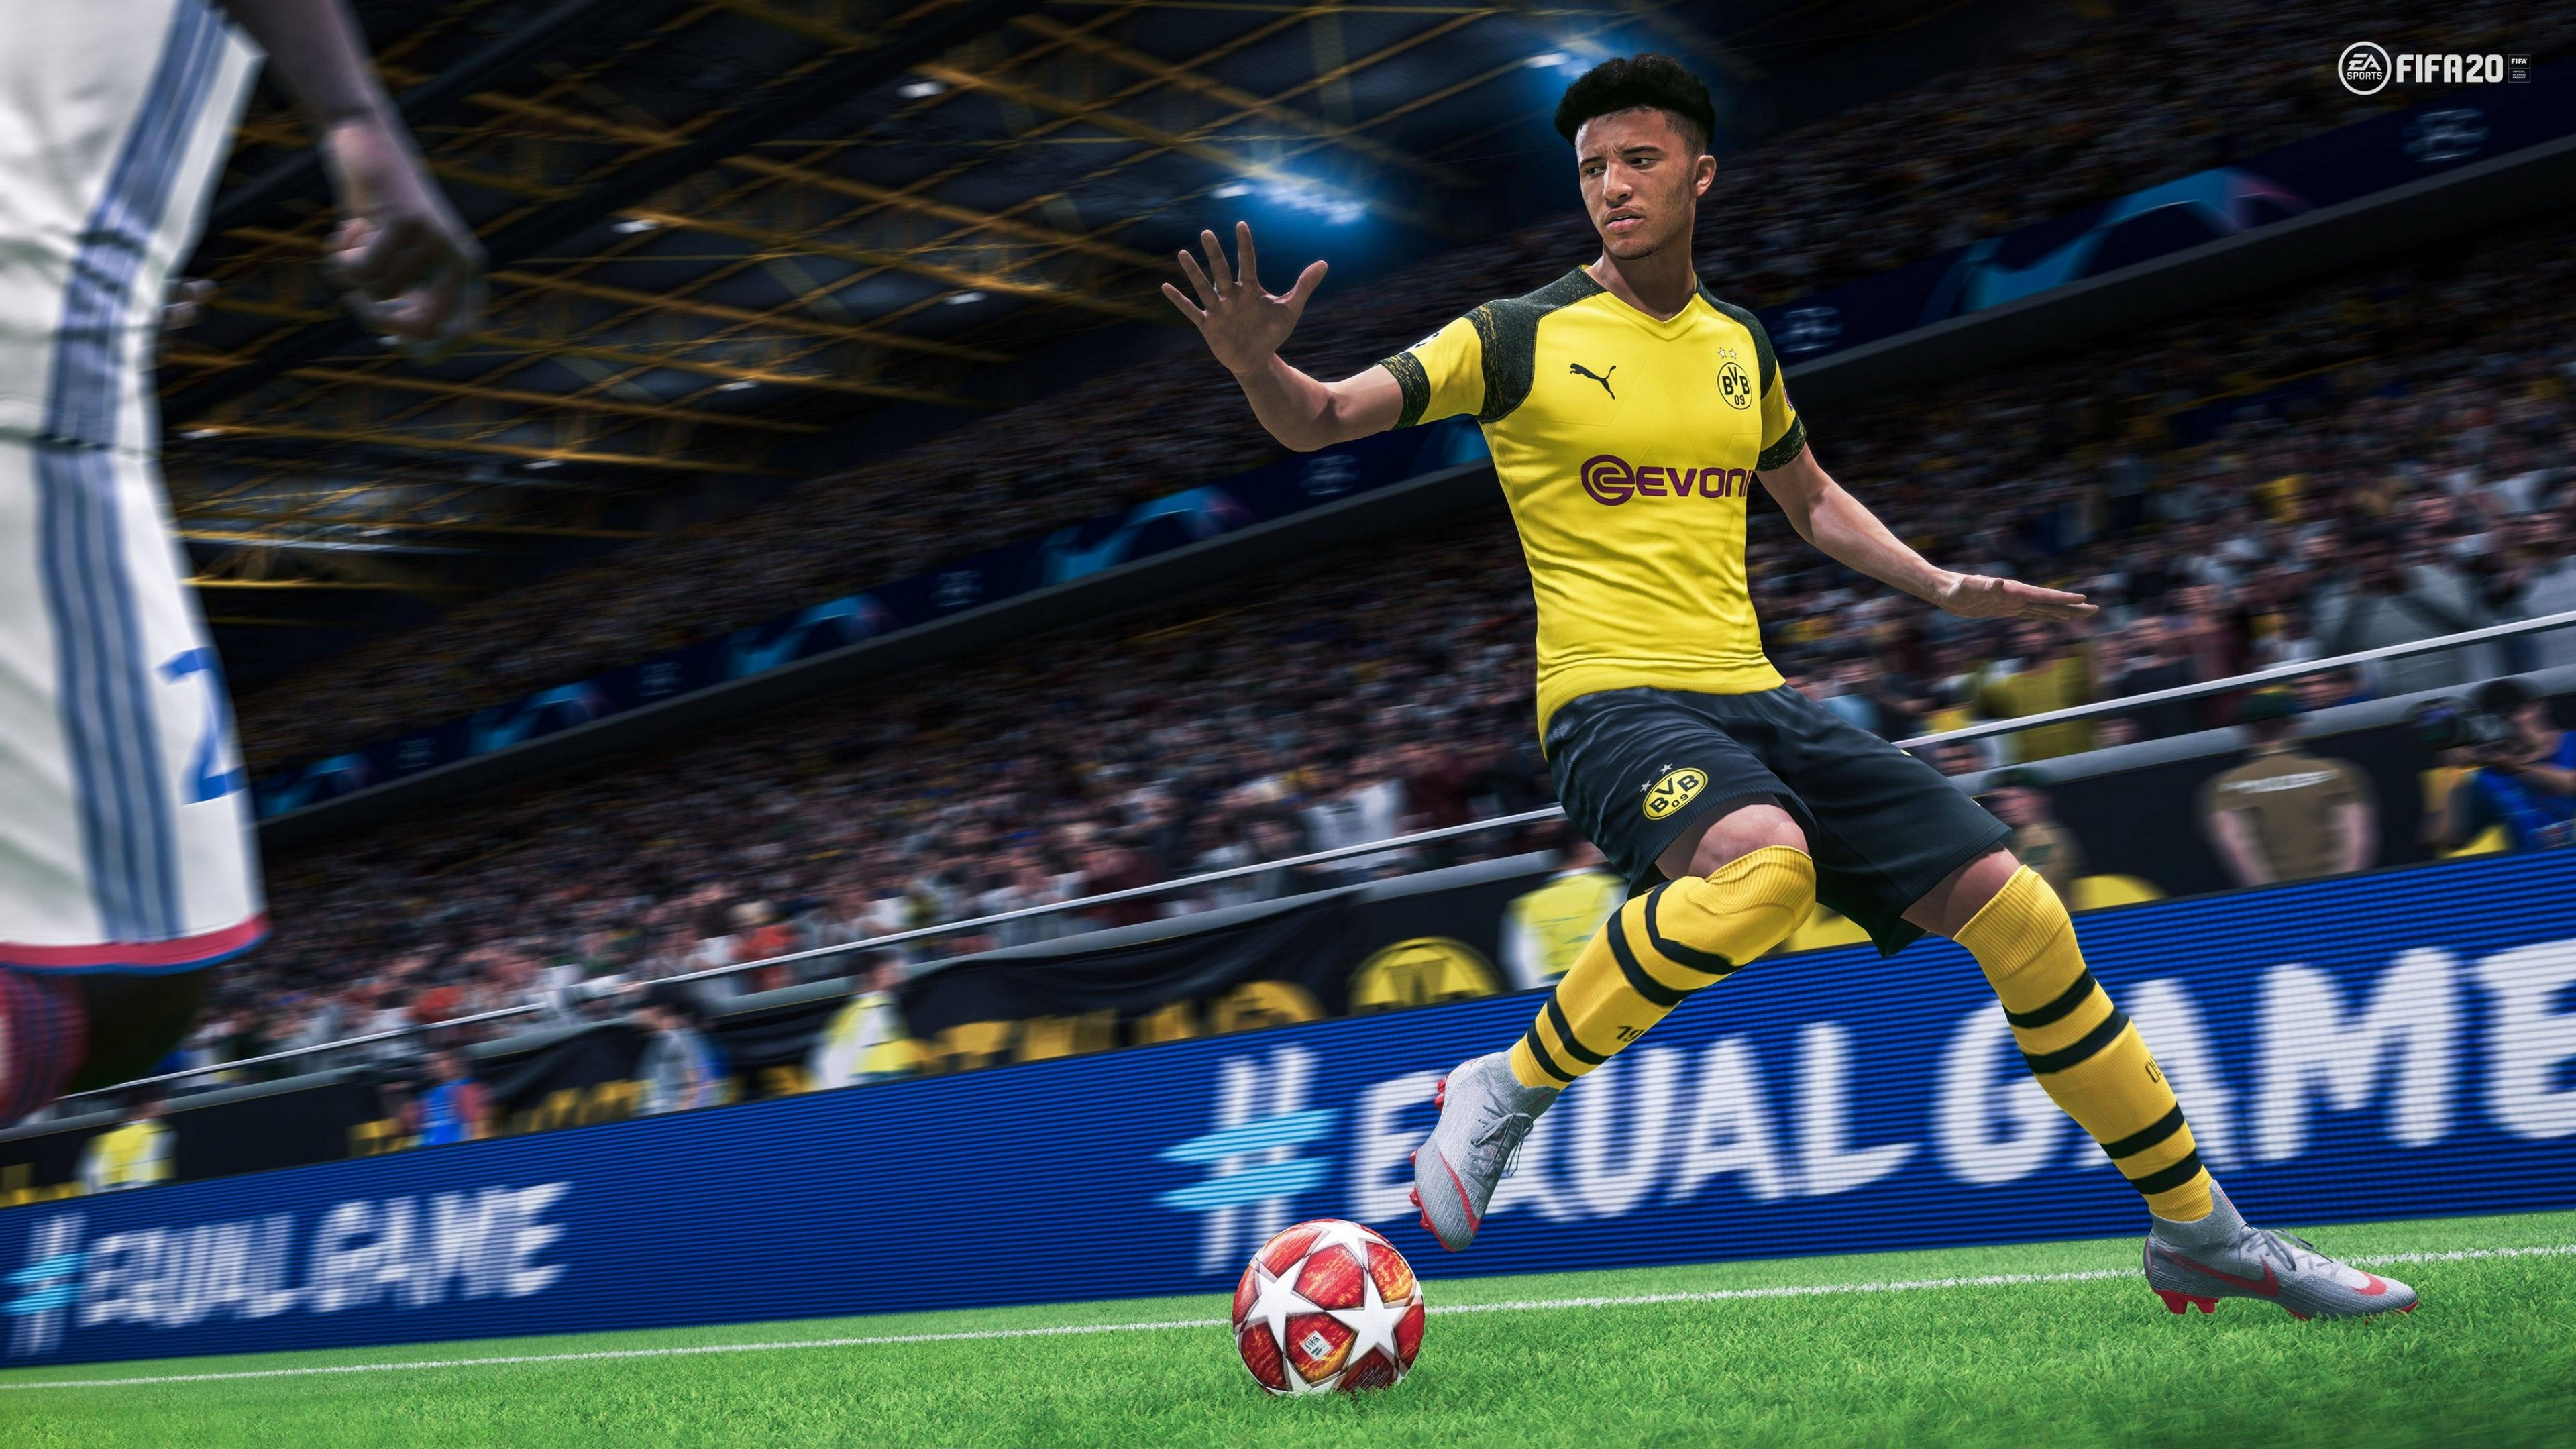 FIFA 20 Standard Edition (Xbox One) - Key - GLOBAL - 3